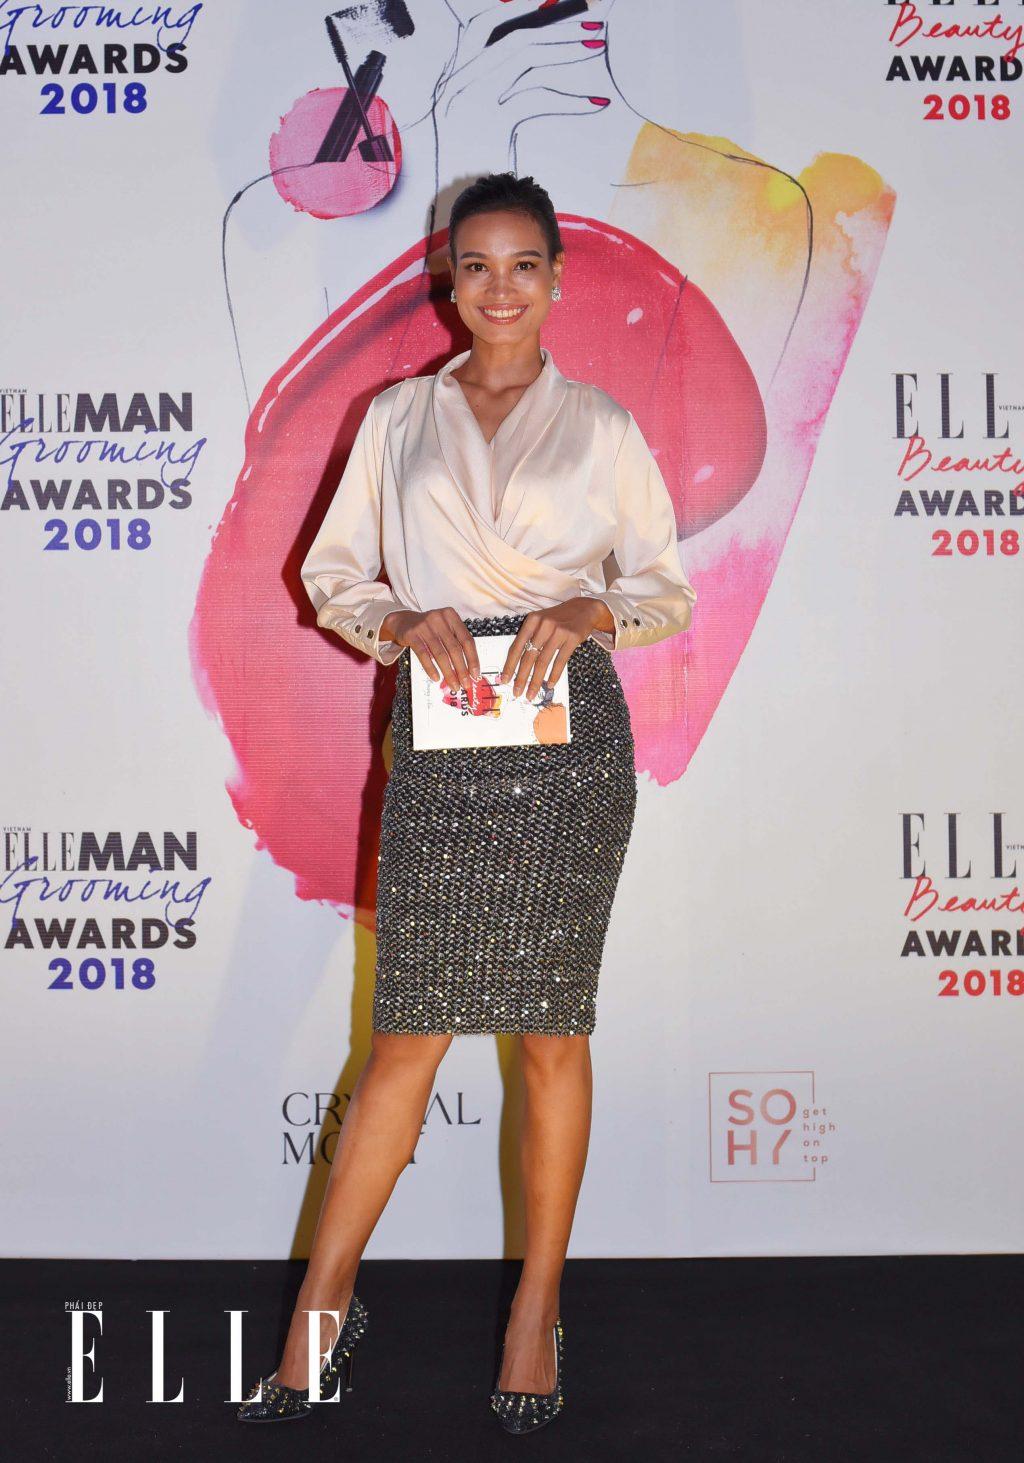 ELLE Beauty Awards 2018 trang điểm ấn tượng 8